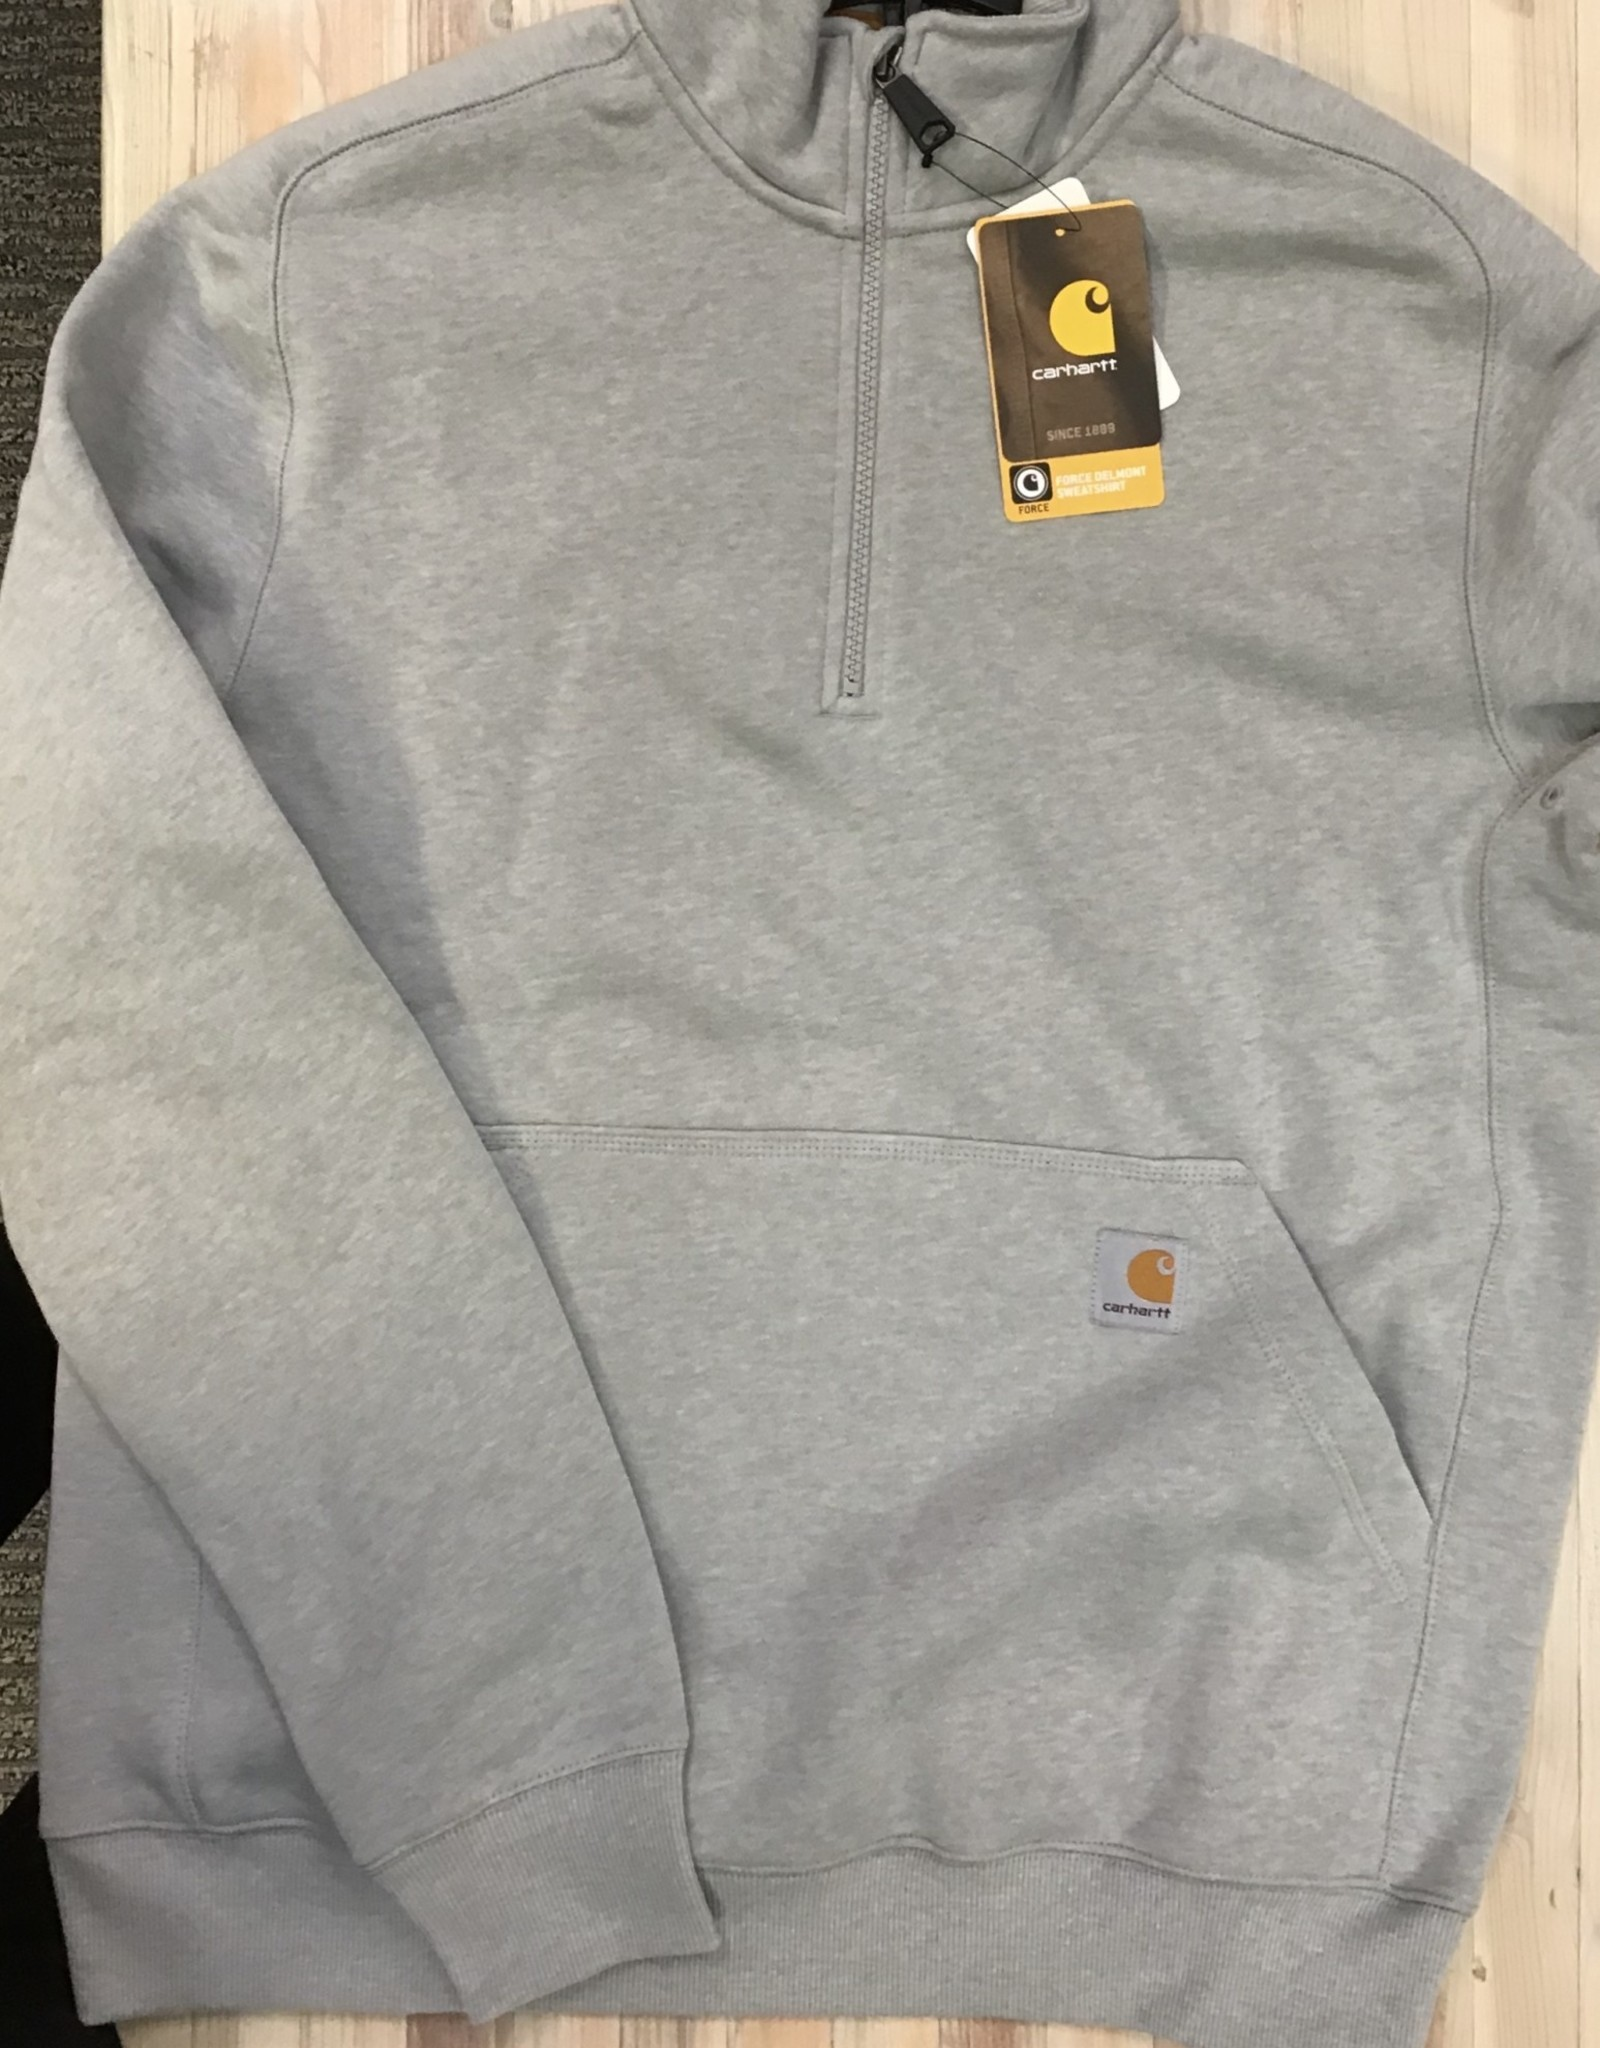 Carhartt Carhartt 104475 Force Delmont Sweatshirt Men's